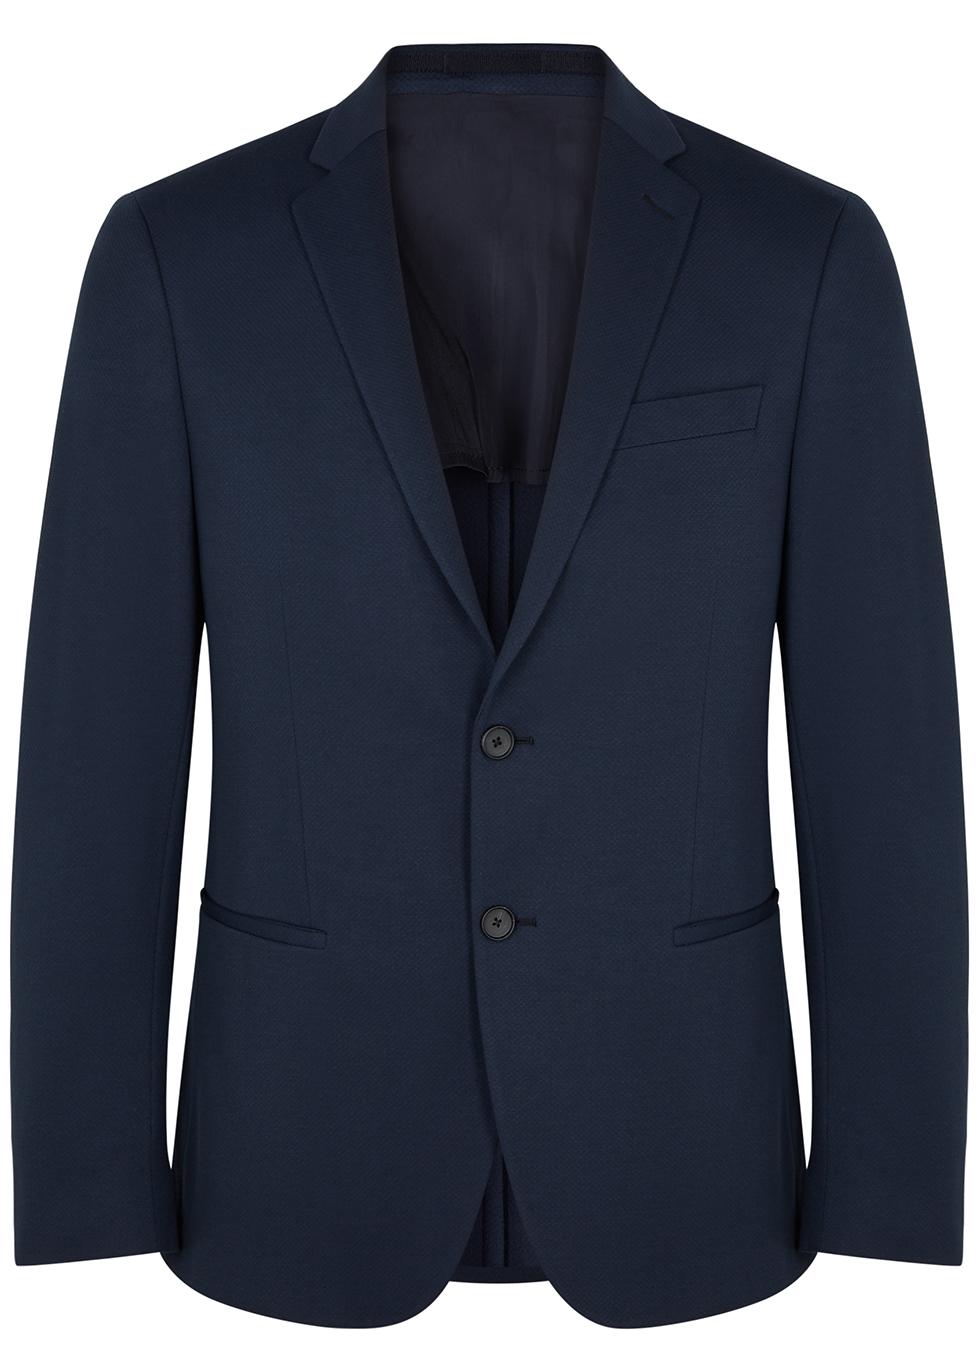 Norwin navy jersey blazer